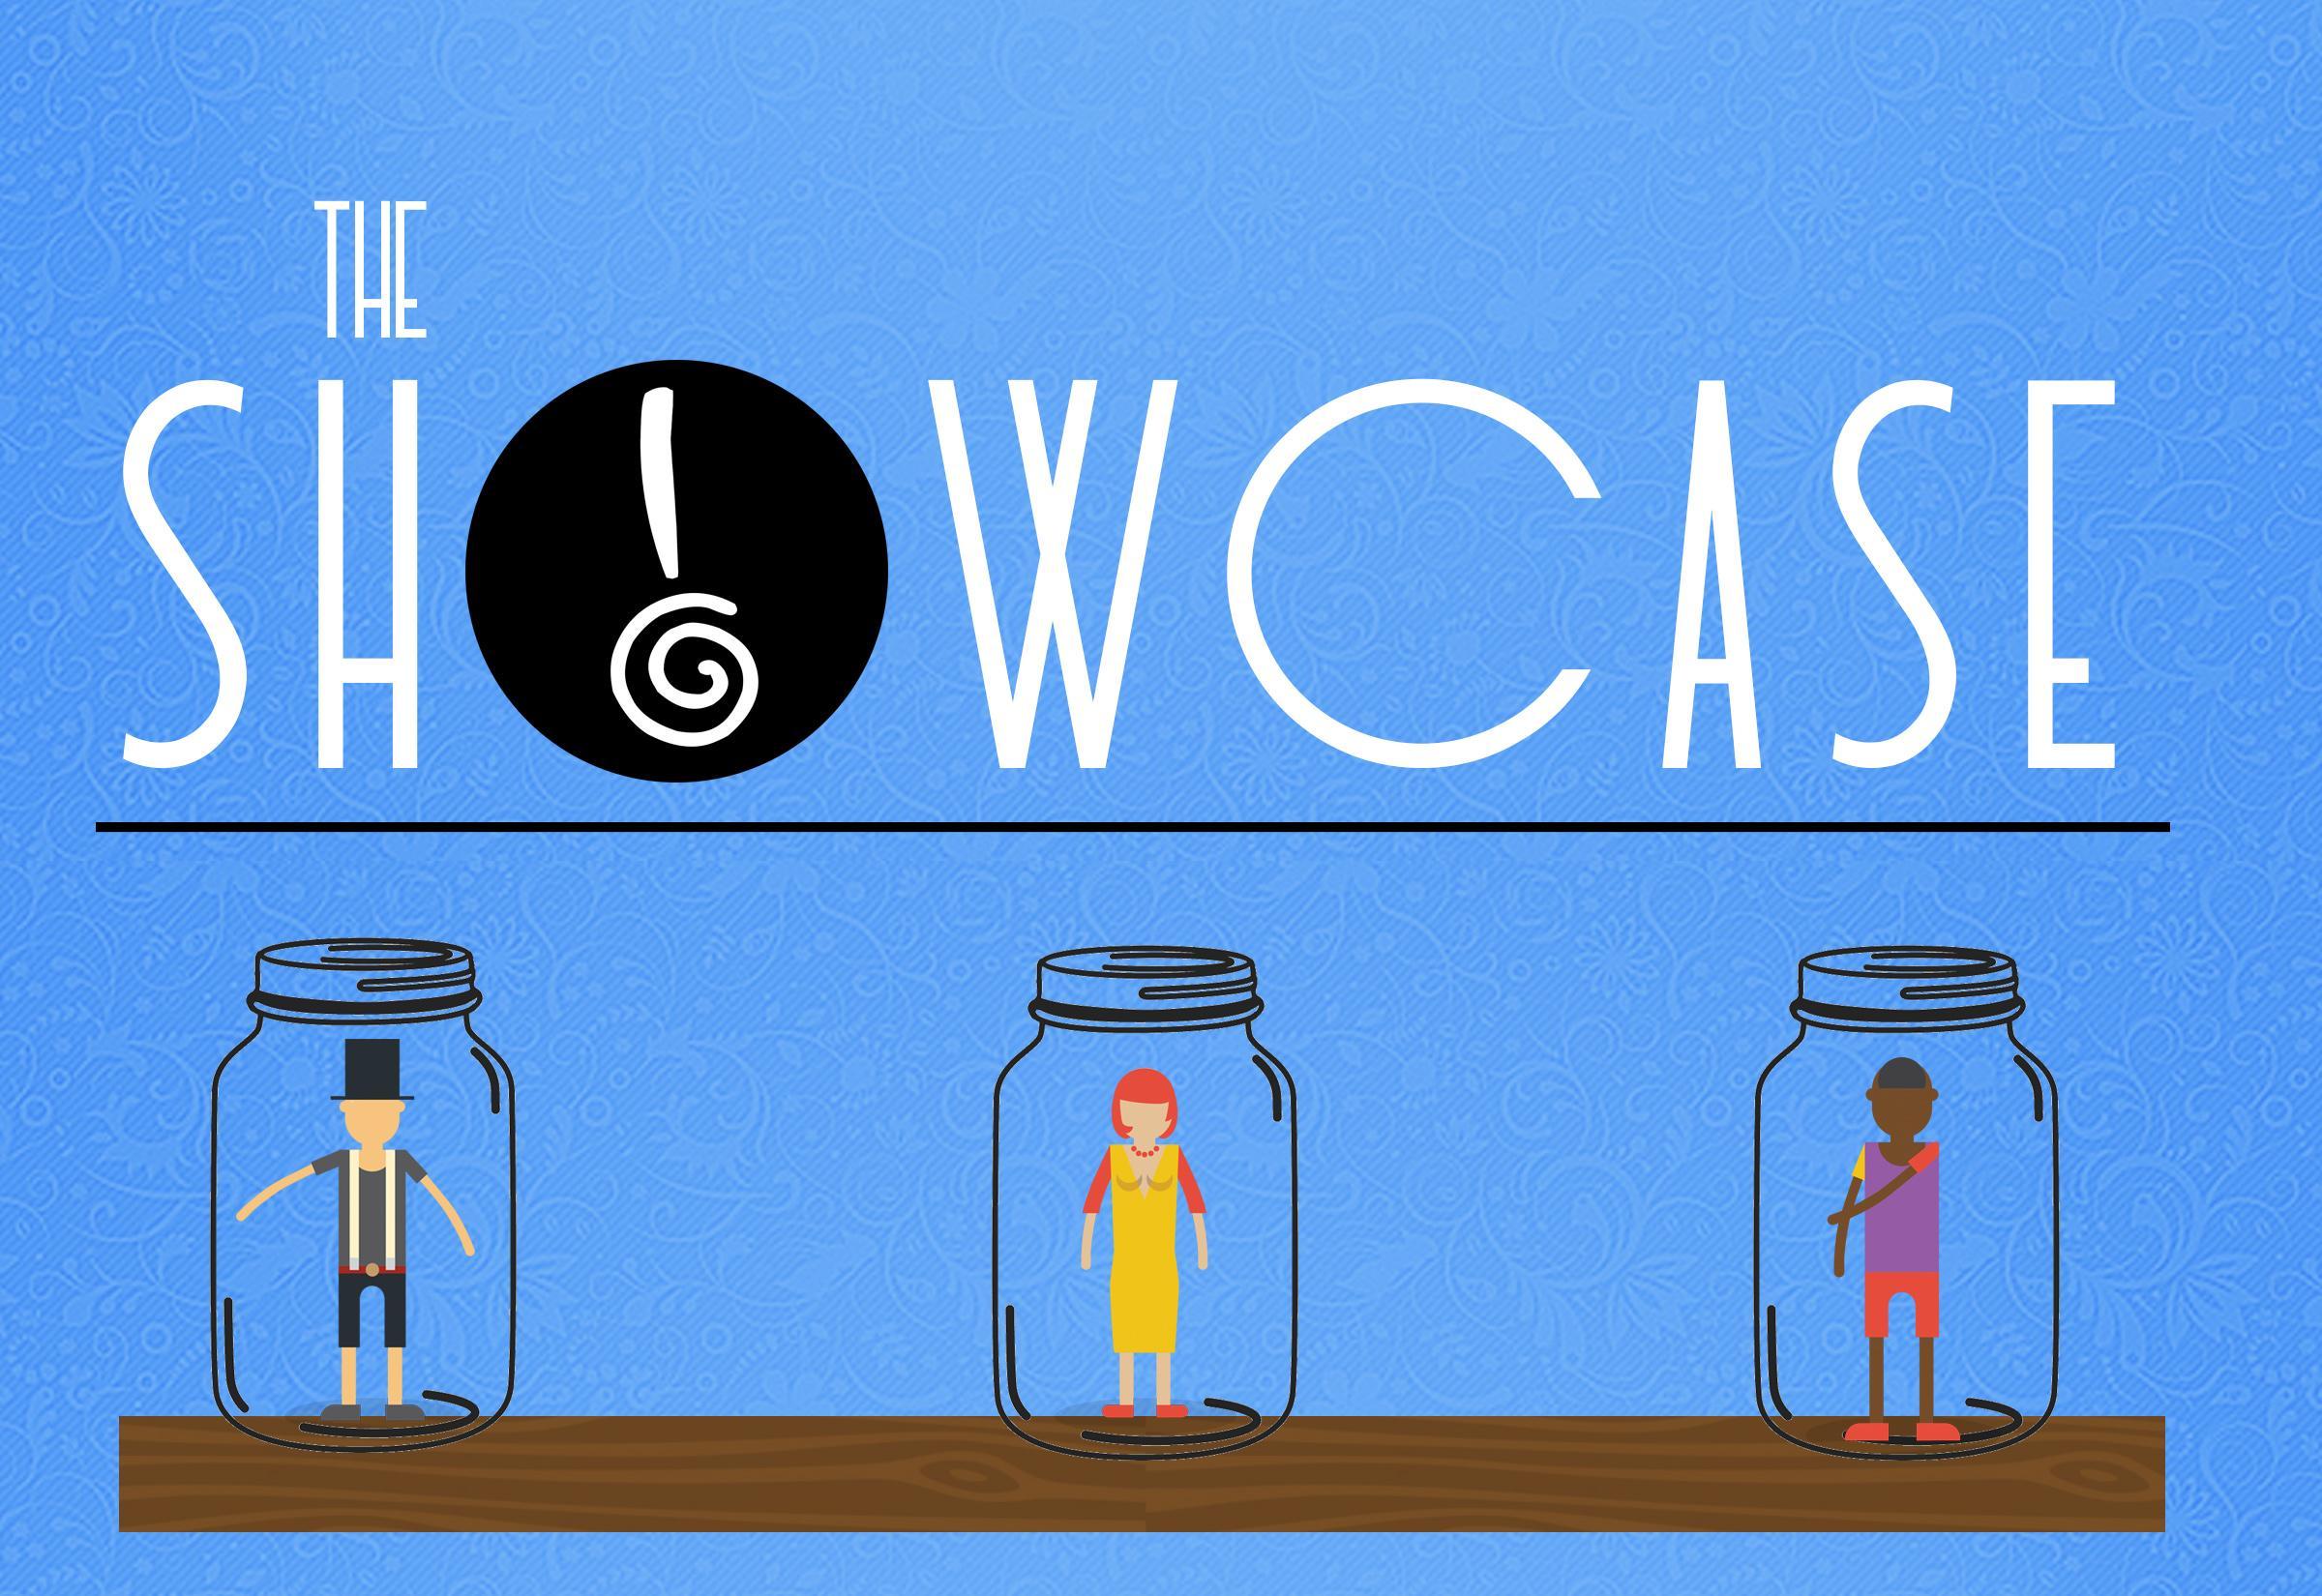 The Showcase